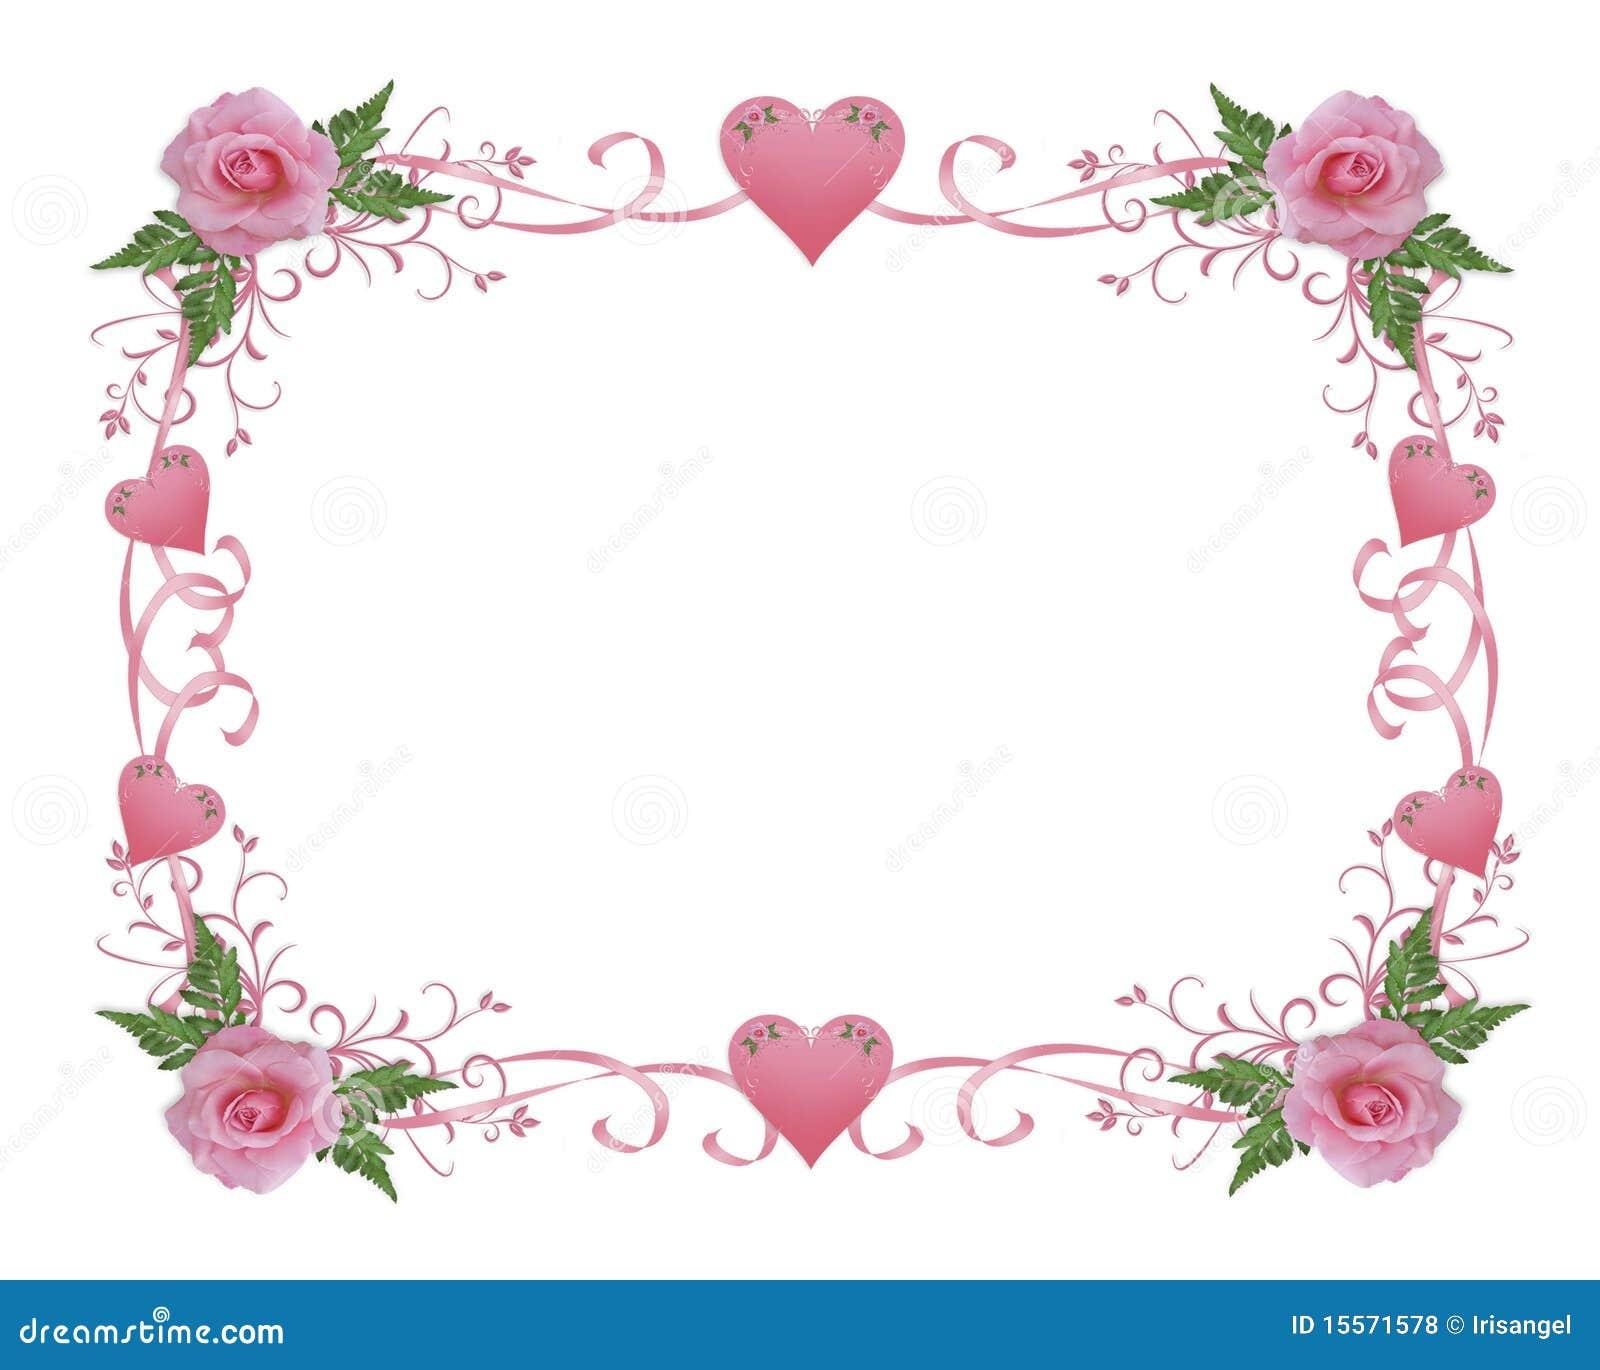 Printable Valentine Invitations as amazing invitations layout